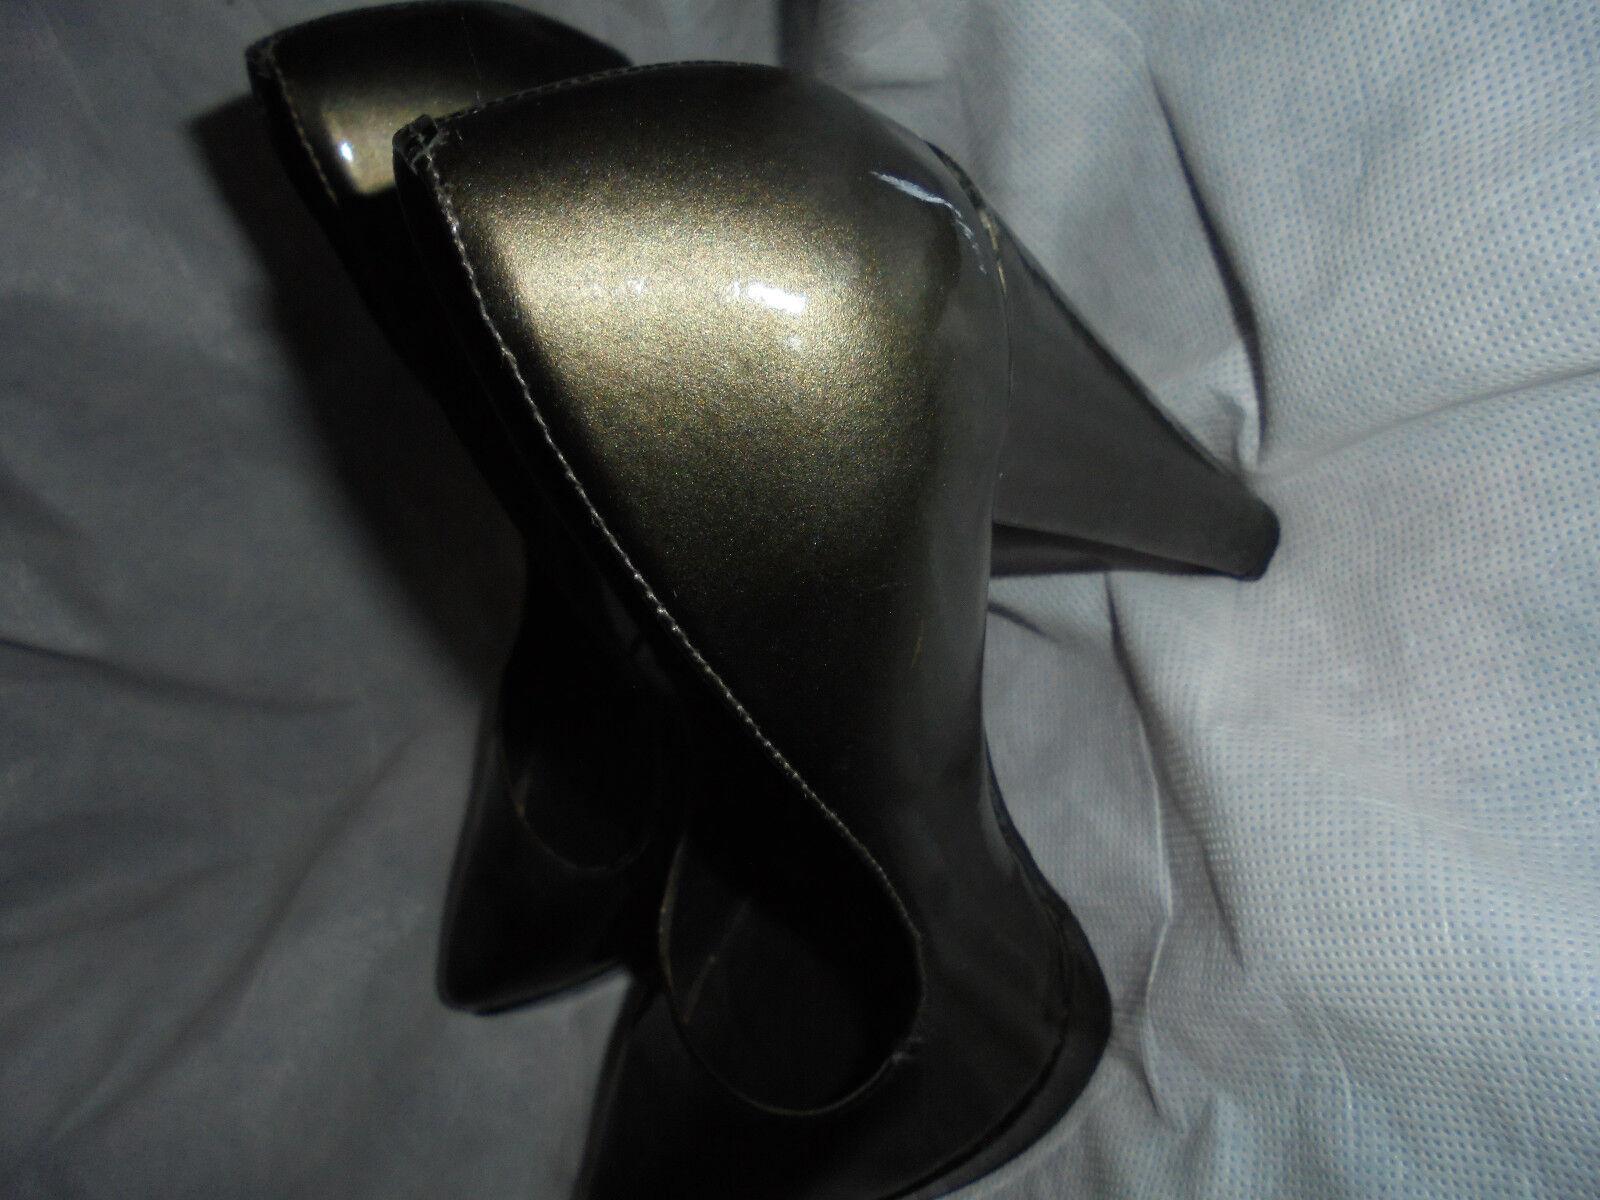 KG WOMEN'S DARK BRONZE LEATHER SLIP SHOES ON HEEL SHOES SLIP SIZE VGC 1fc2c4